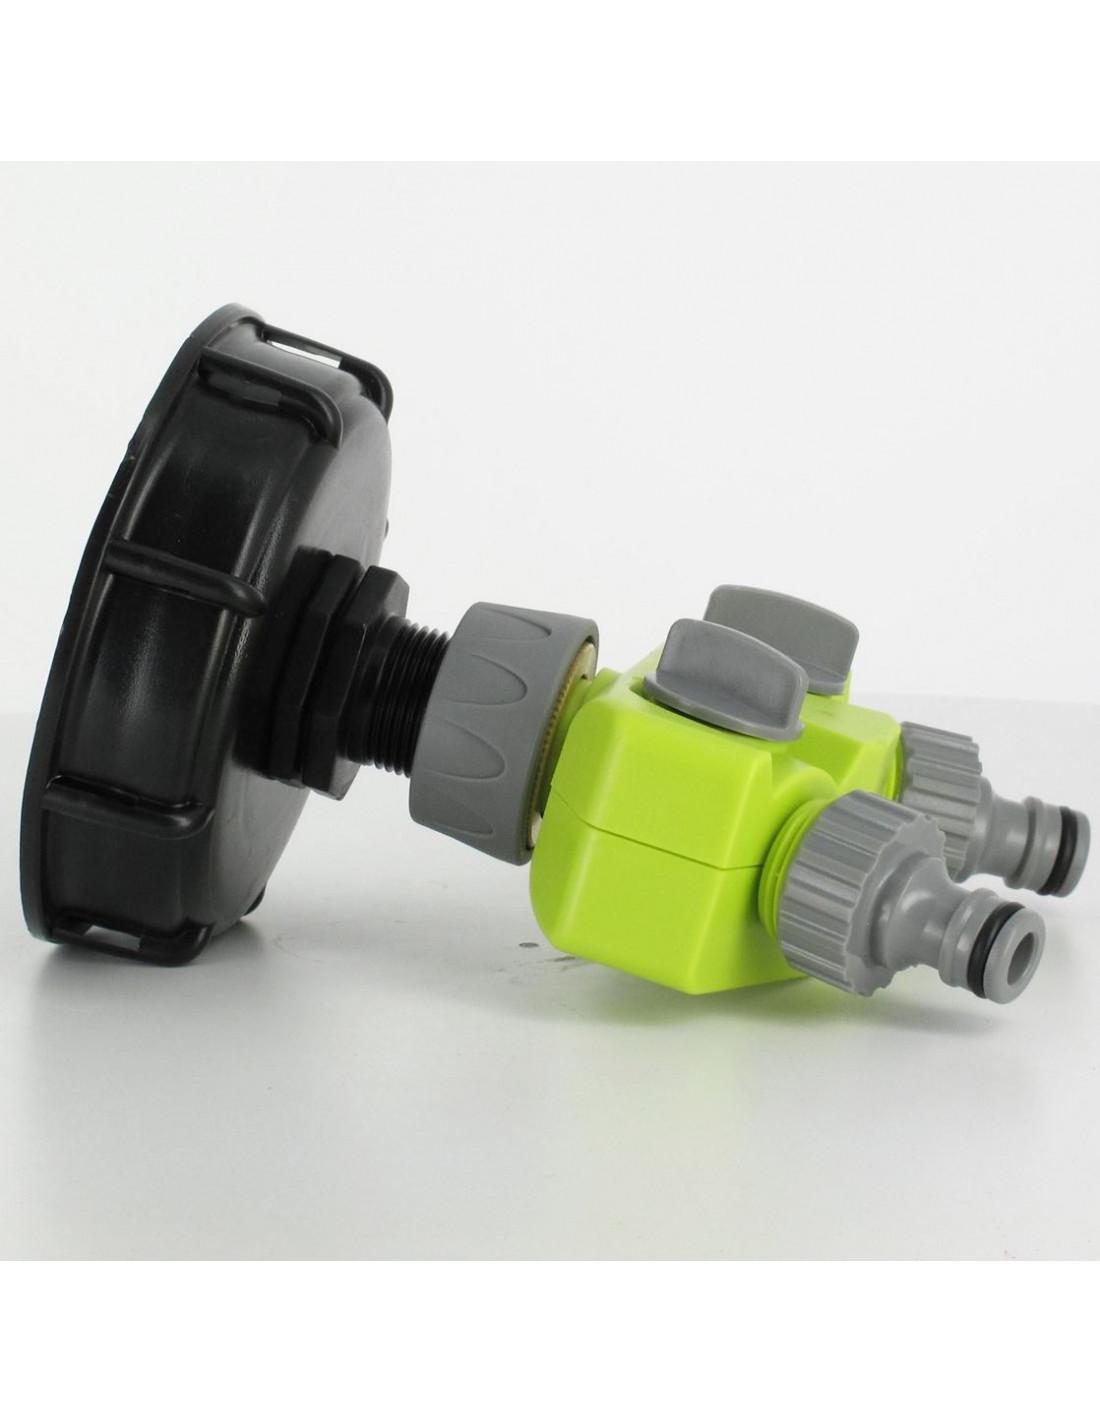 Raccord s100x8 cuve eau 2 robinets avec nez type gardena - Raccord cuve 1000 l ...